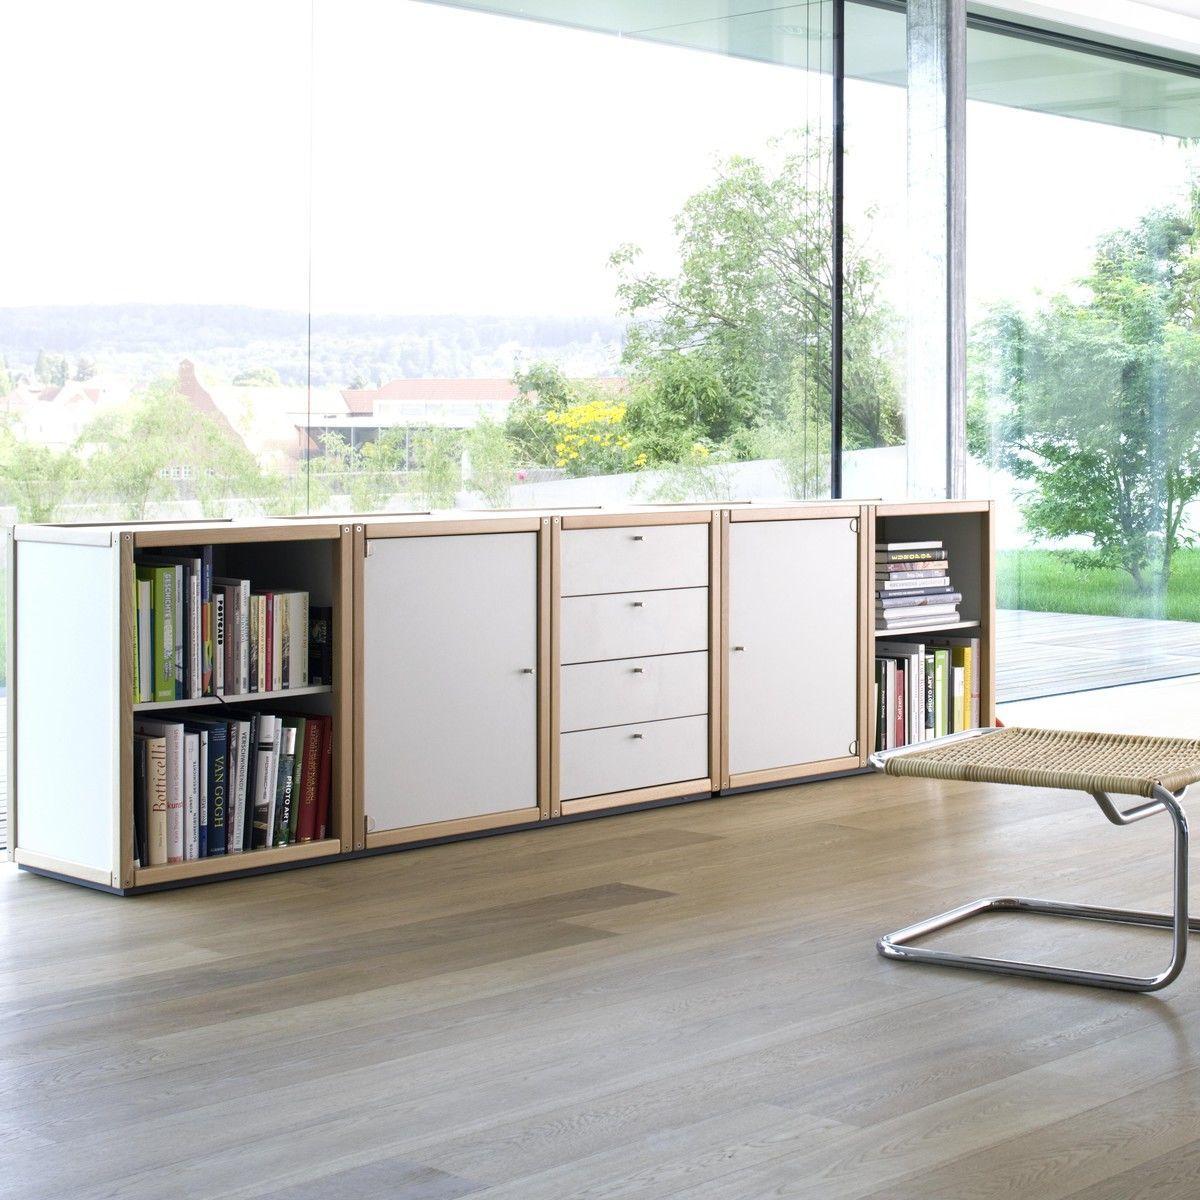 fl totto profilsystem container offen fl totto. Black Bedroom Furniture Sets. Home Design Ideas